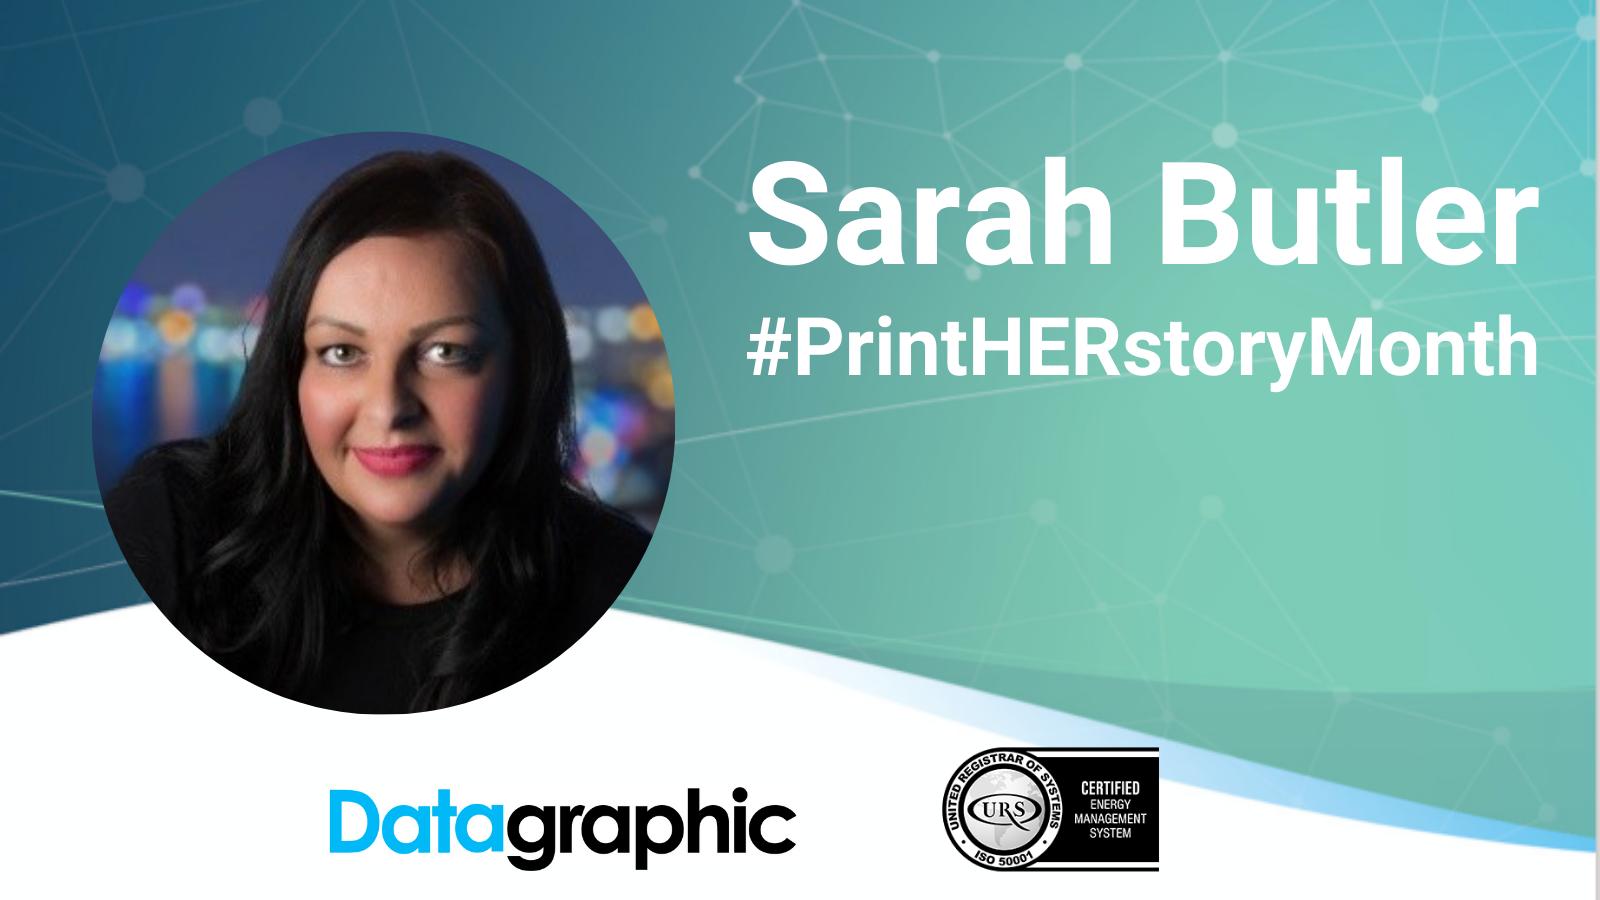 Sarah Butler General Manager PrintHERstoryMonth